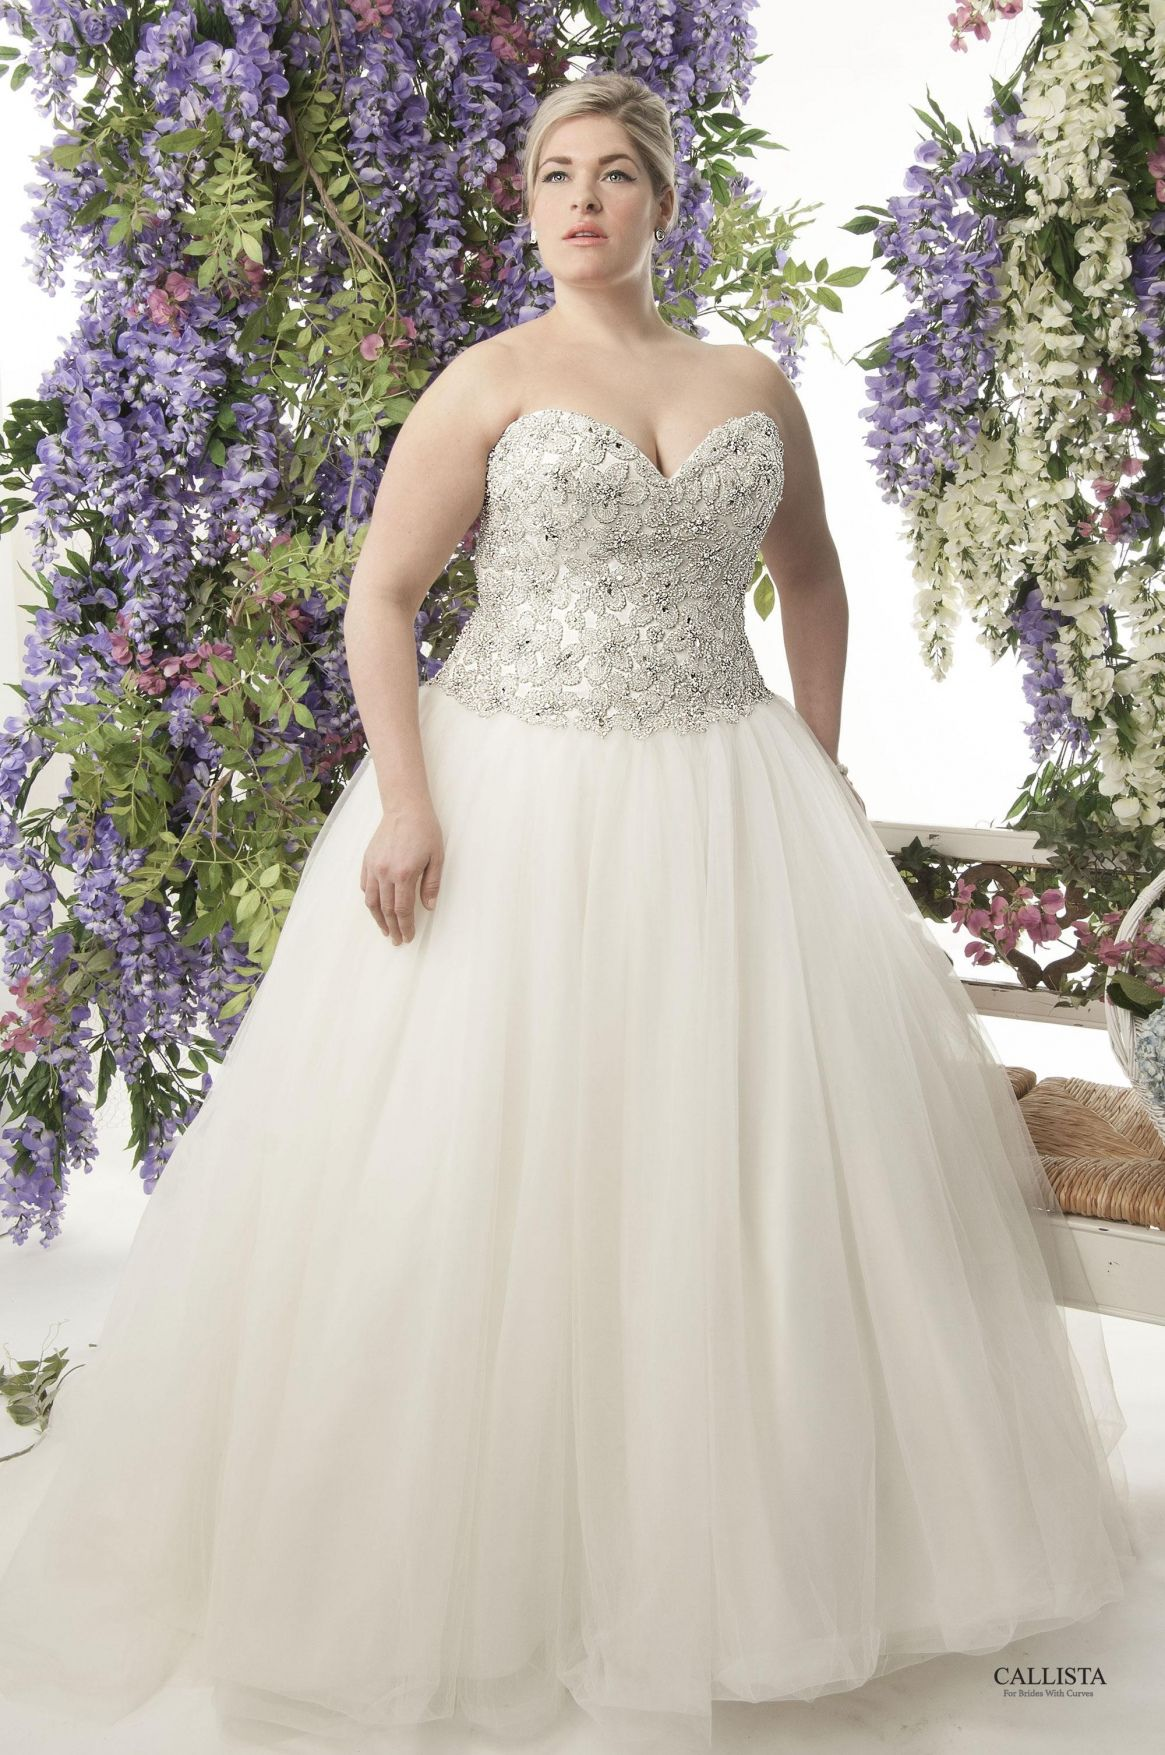 50+ Wedding Dresses El Paso Tx - Wedding Dresses for Fall Check more ...